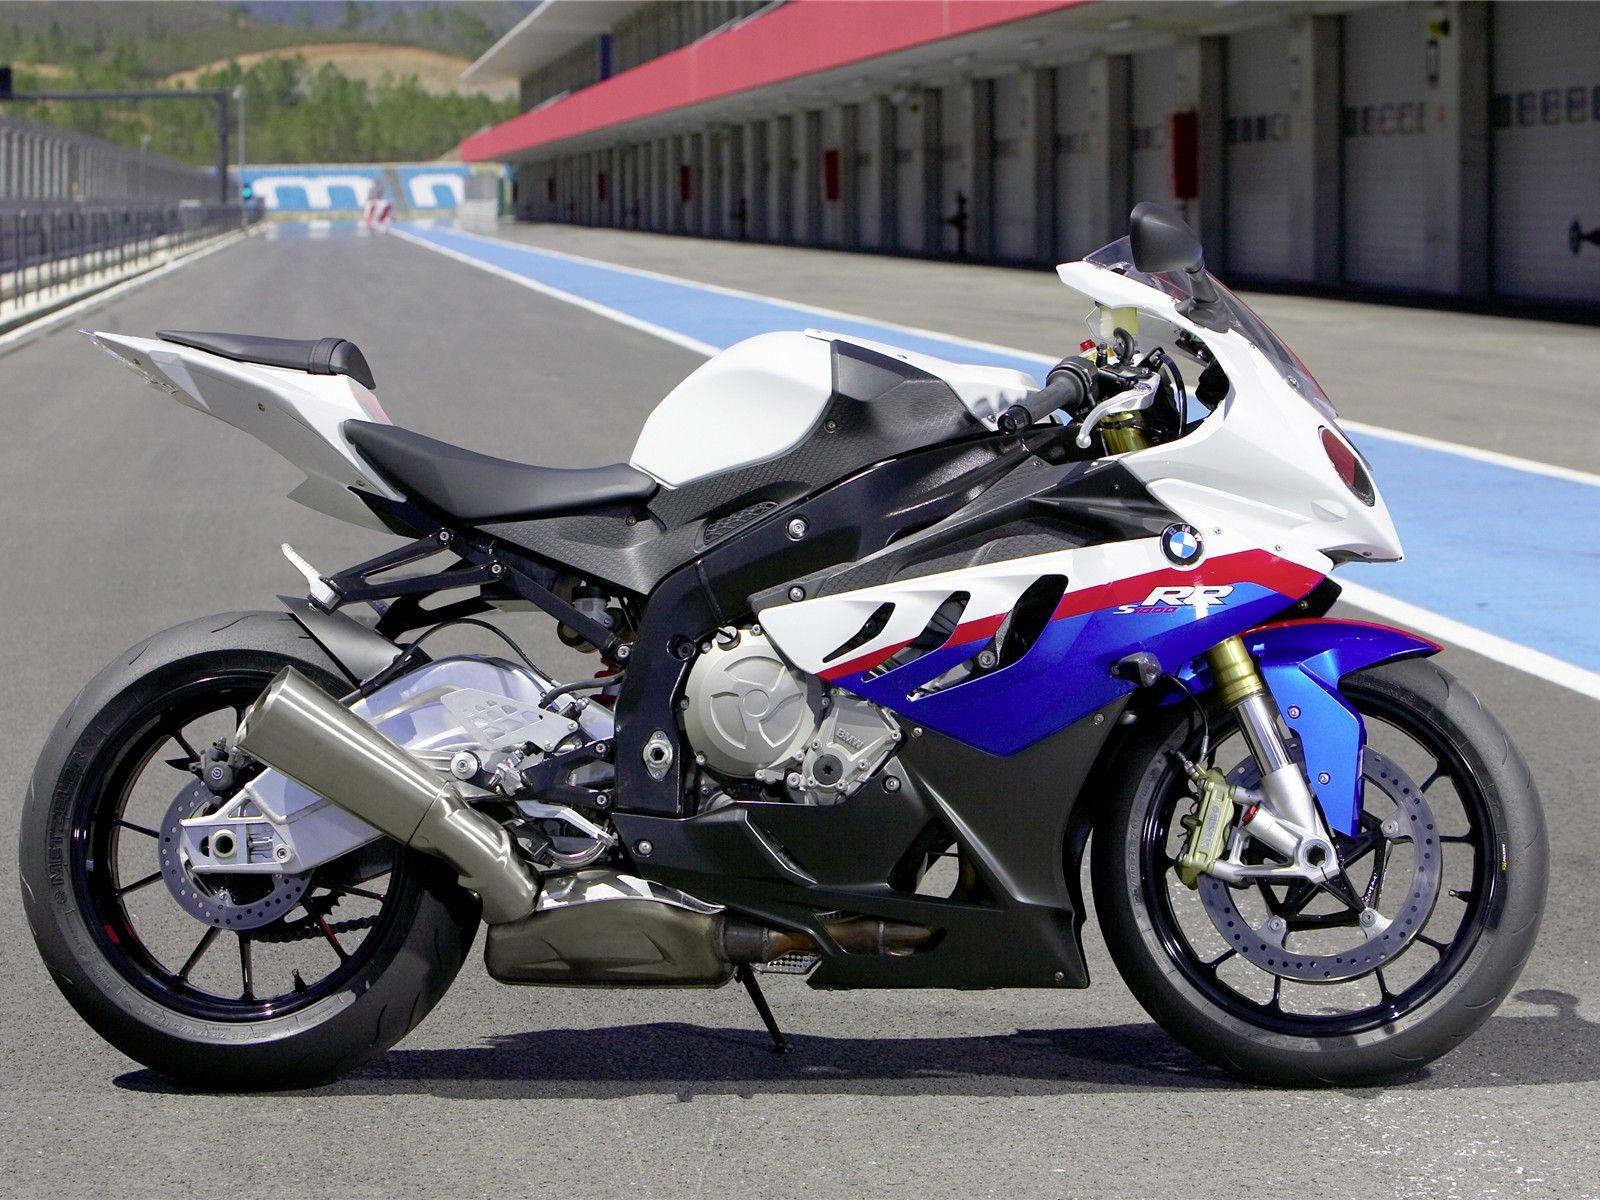 BMW R1000 | *2 & 3 Wheels | Pinterest | BMW, Bmw motorcycles and ...